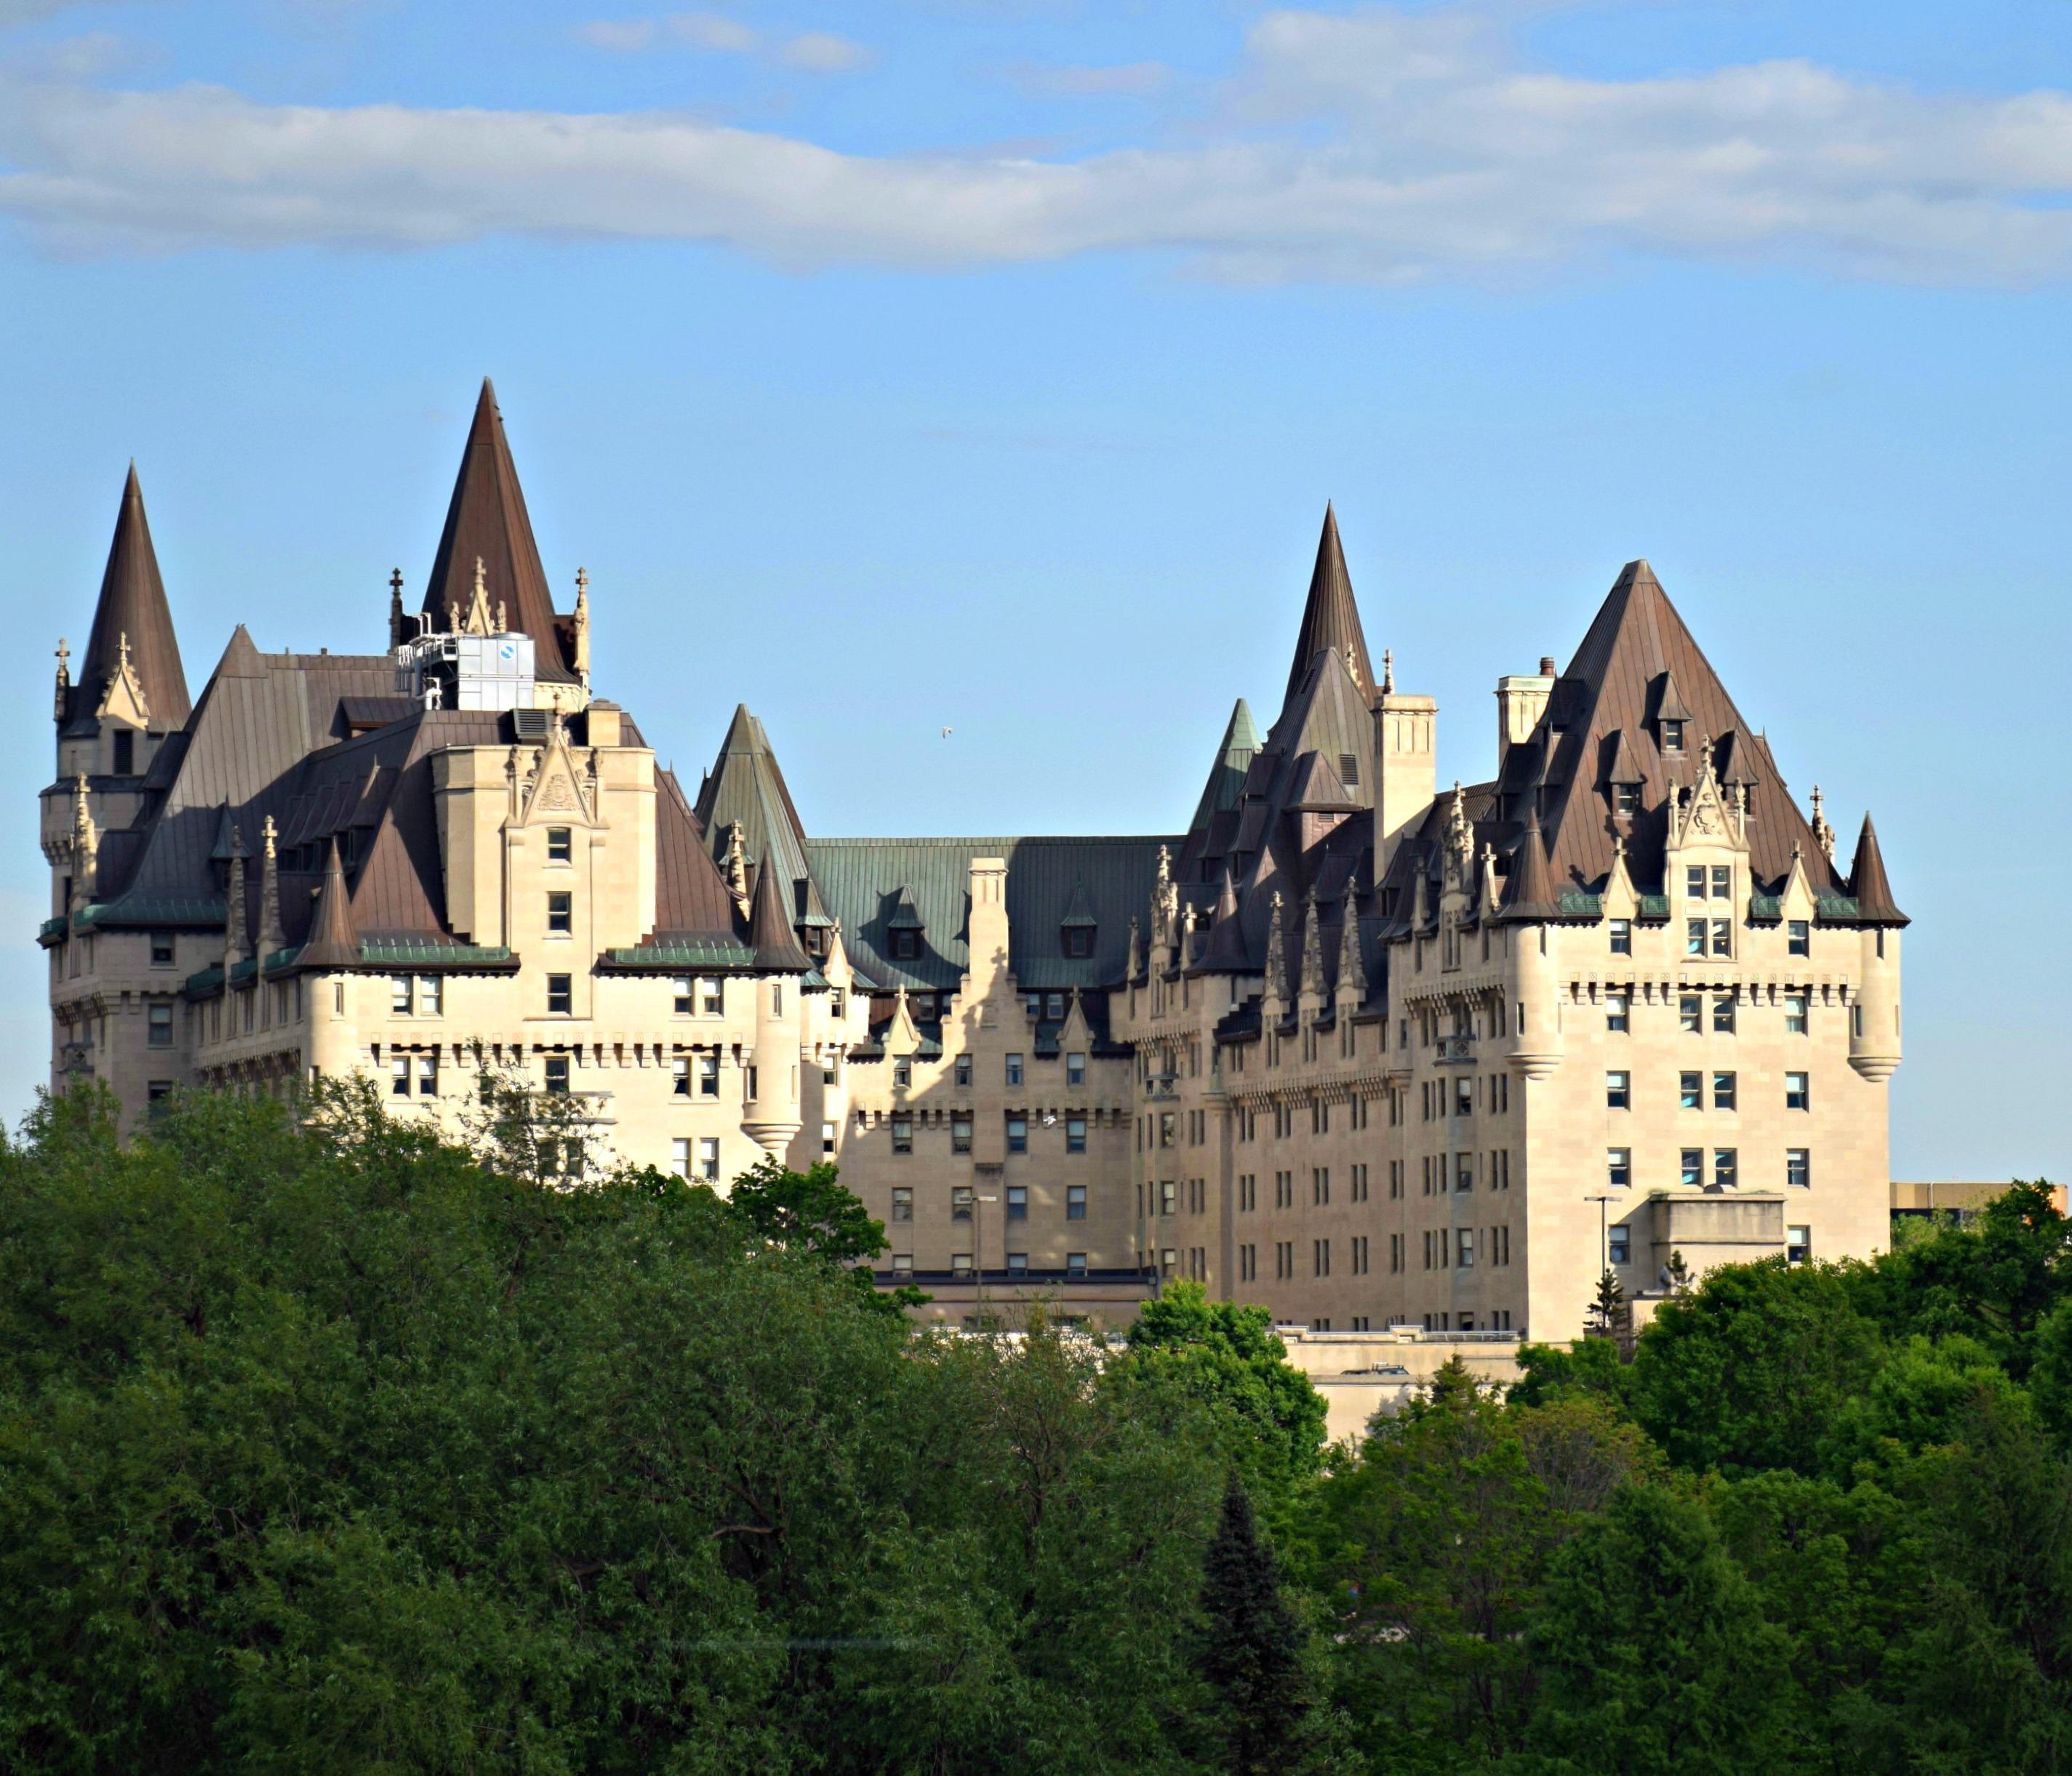 Chateau Laurier Ottawa